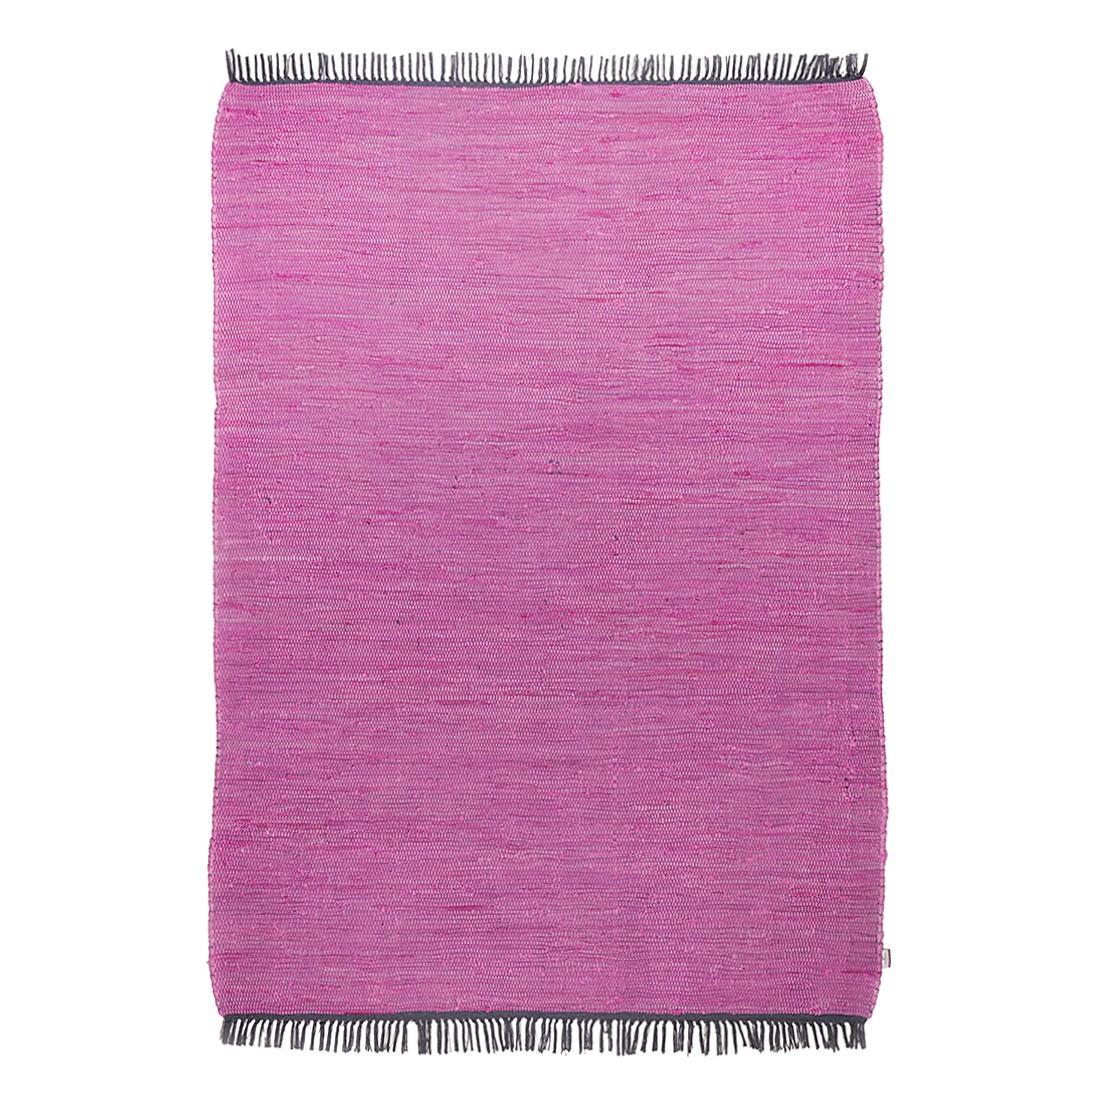 Vloerkleed Cotton - Paars - 80x150cm, Tom Tailor